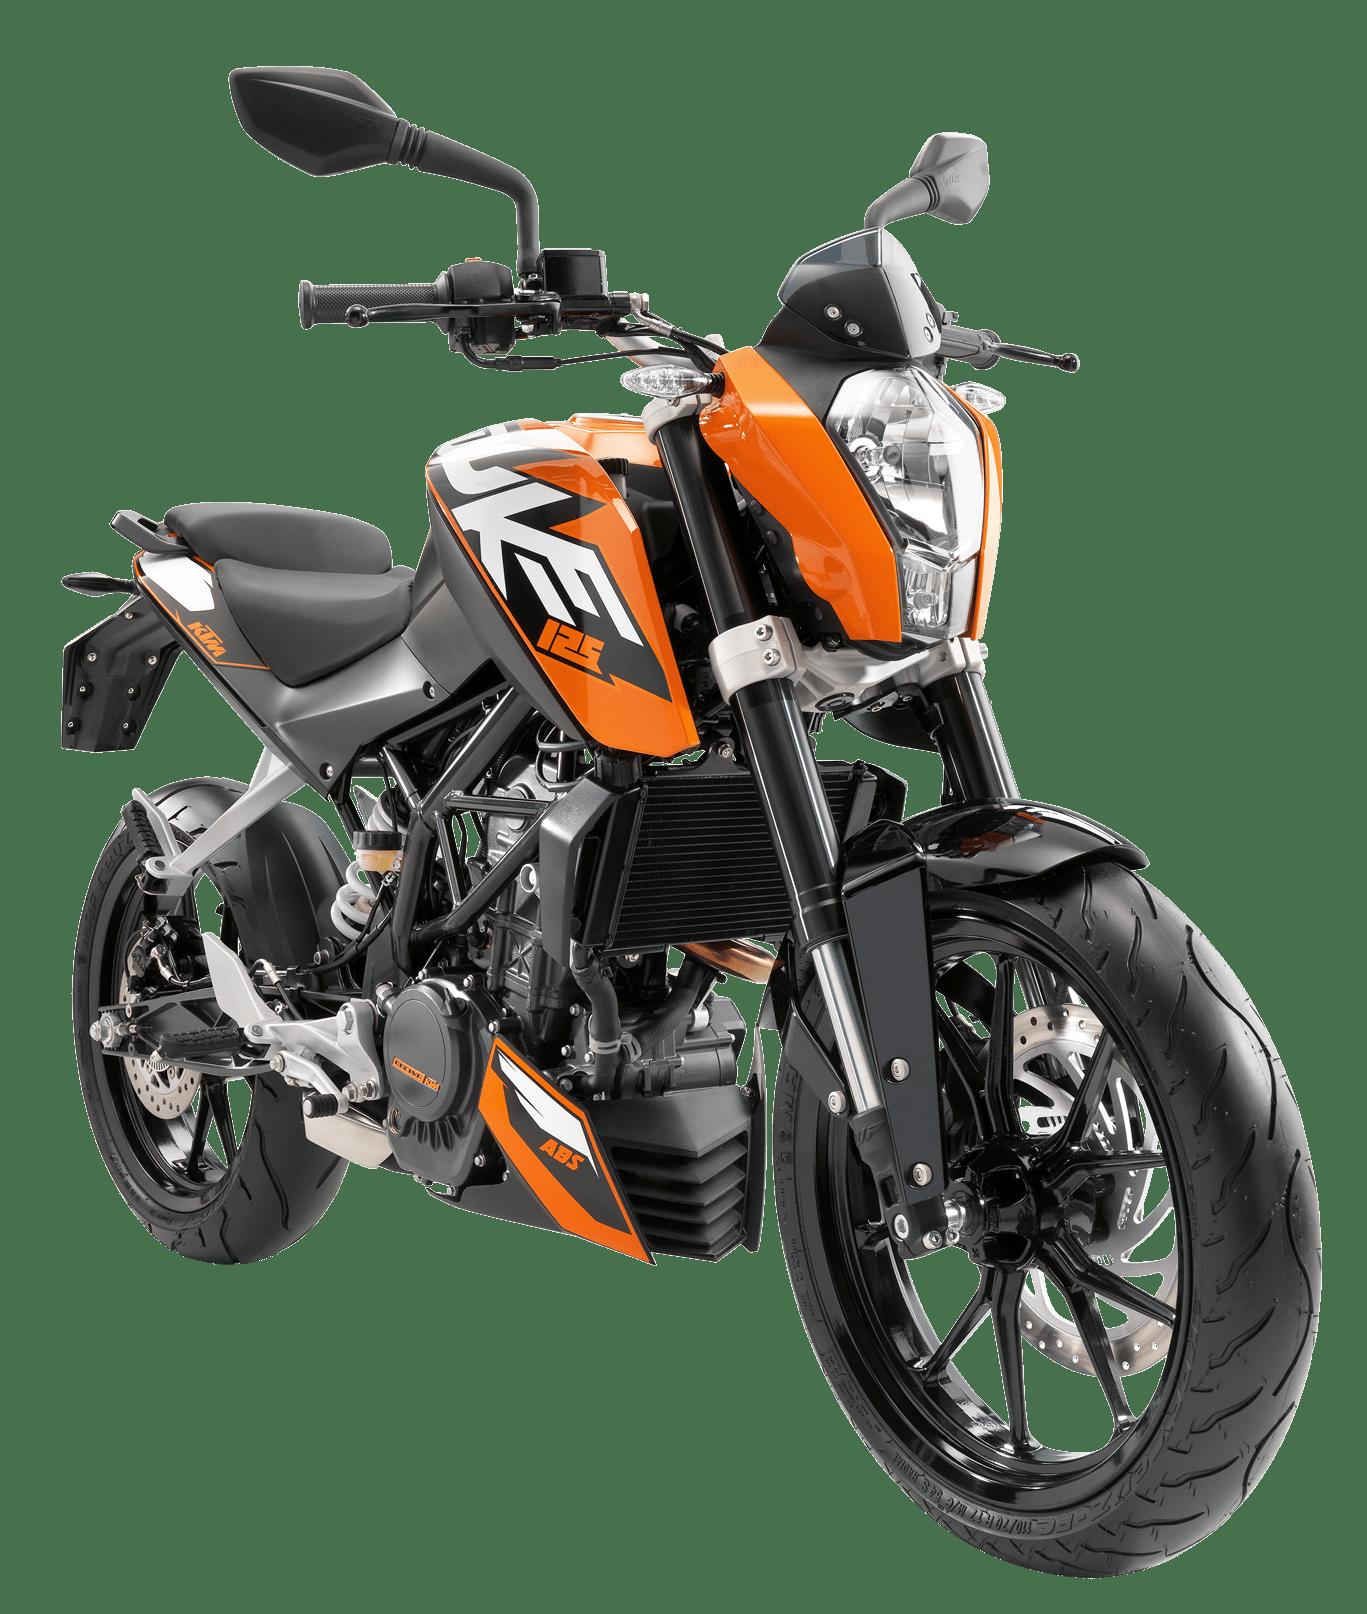 Kawasaki Ninja Zx 10r Sport Motorcycle Bike Png Image Pngpix - PNG HD Bike